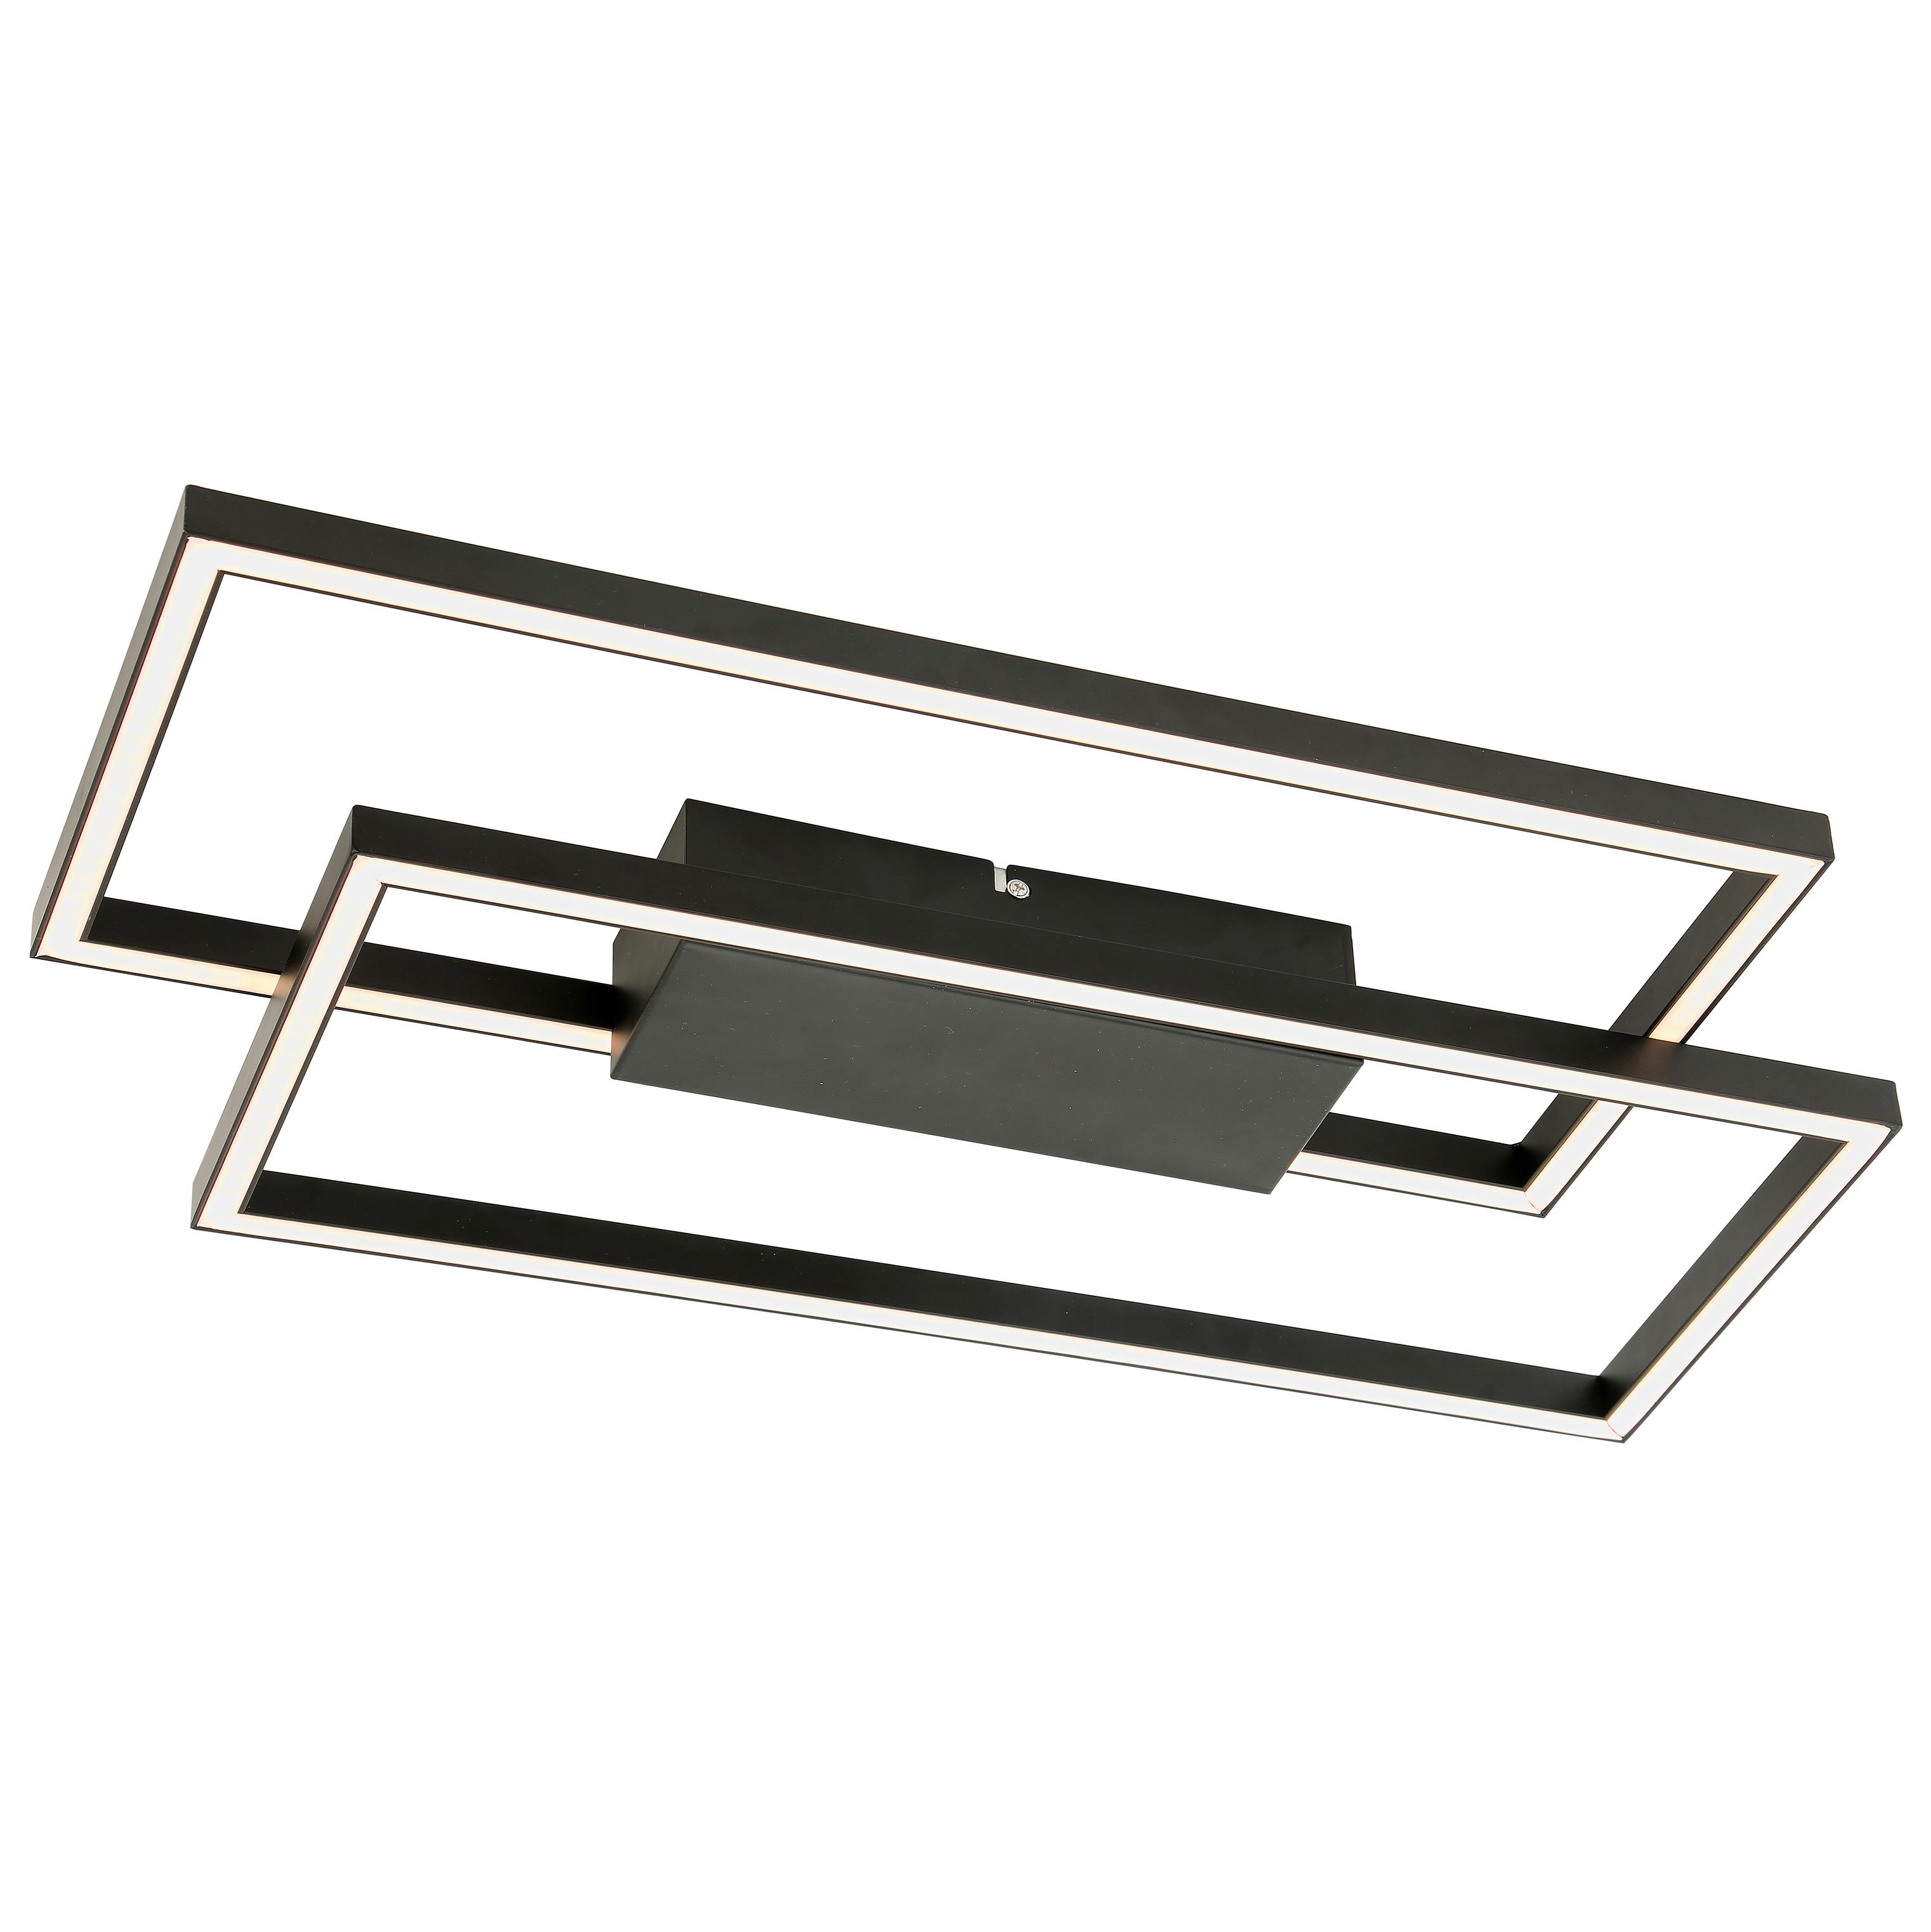 Plafonnier en métal noir